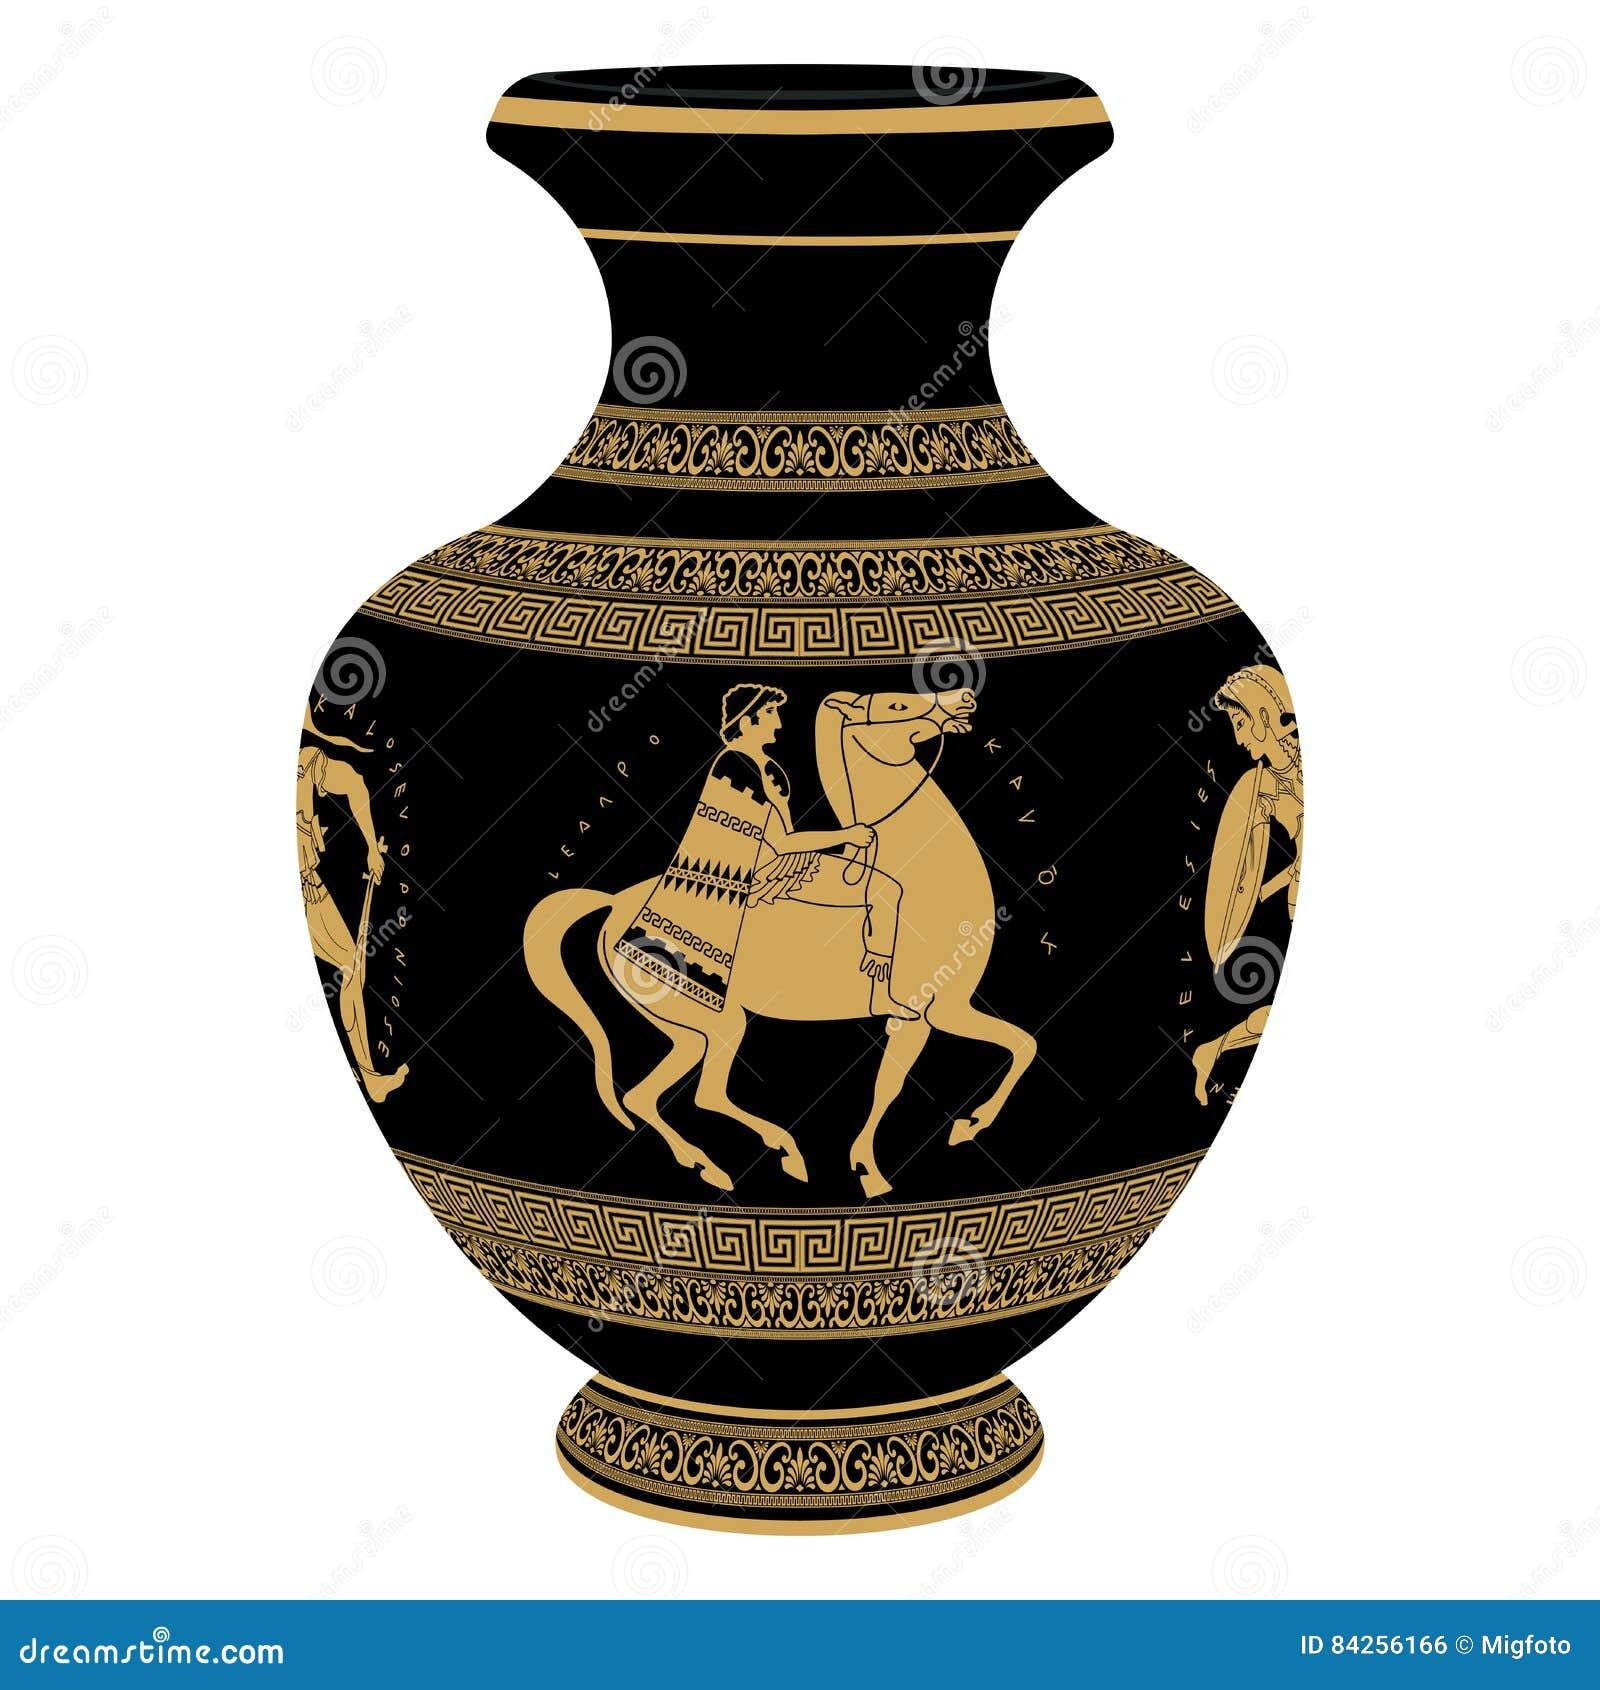 Greek vase stock illustrations 989 greek vase stock greek vase stock illustrations 989 greek vase stock illustrations vectors clipart dreamstime reviewsmspy